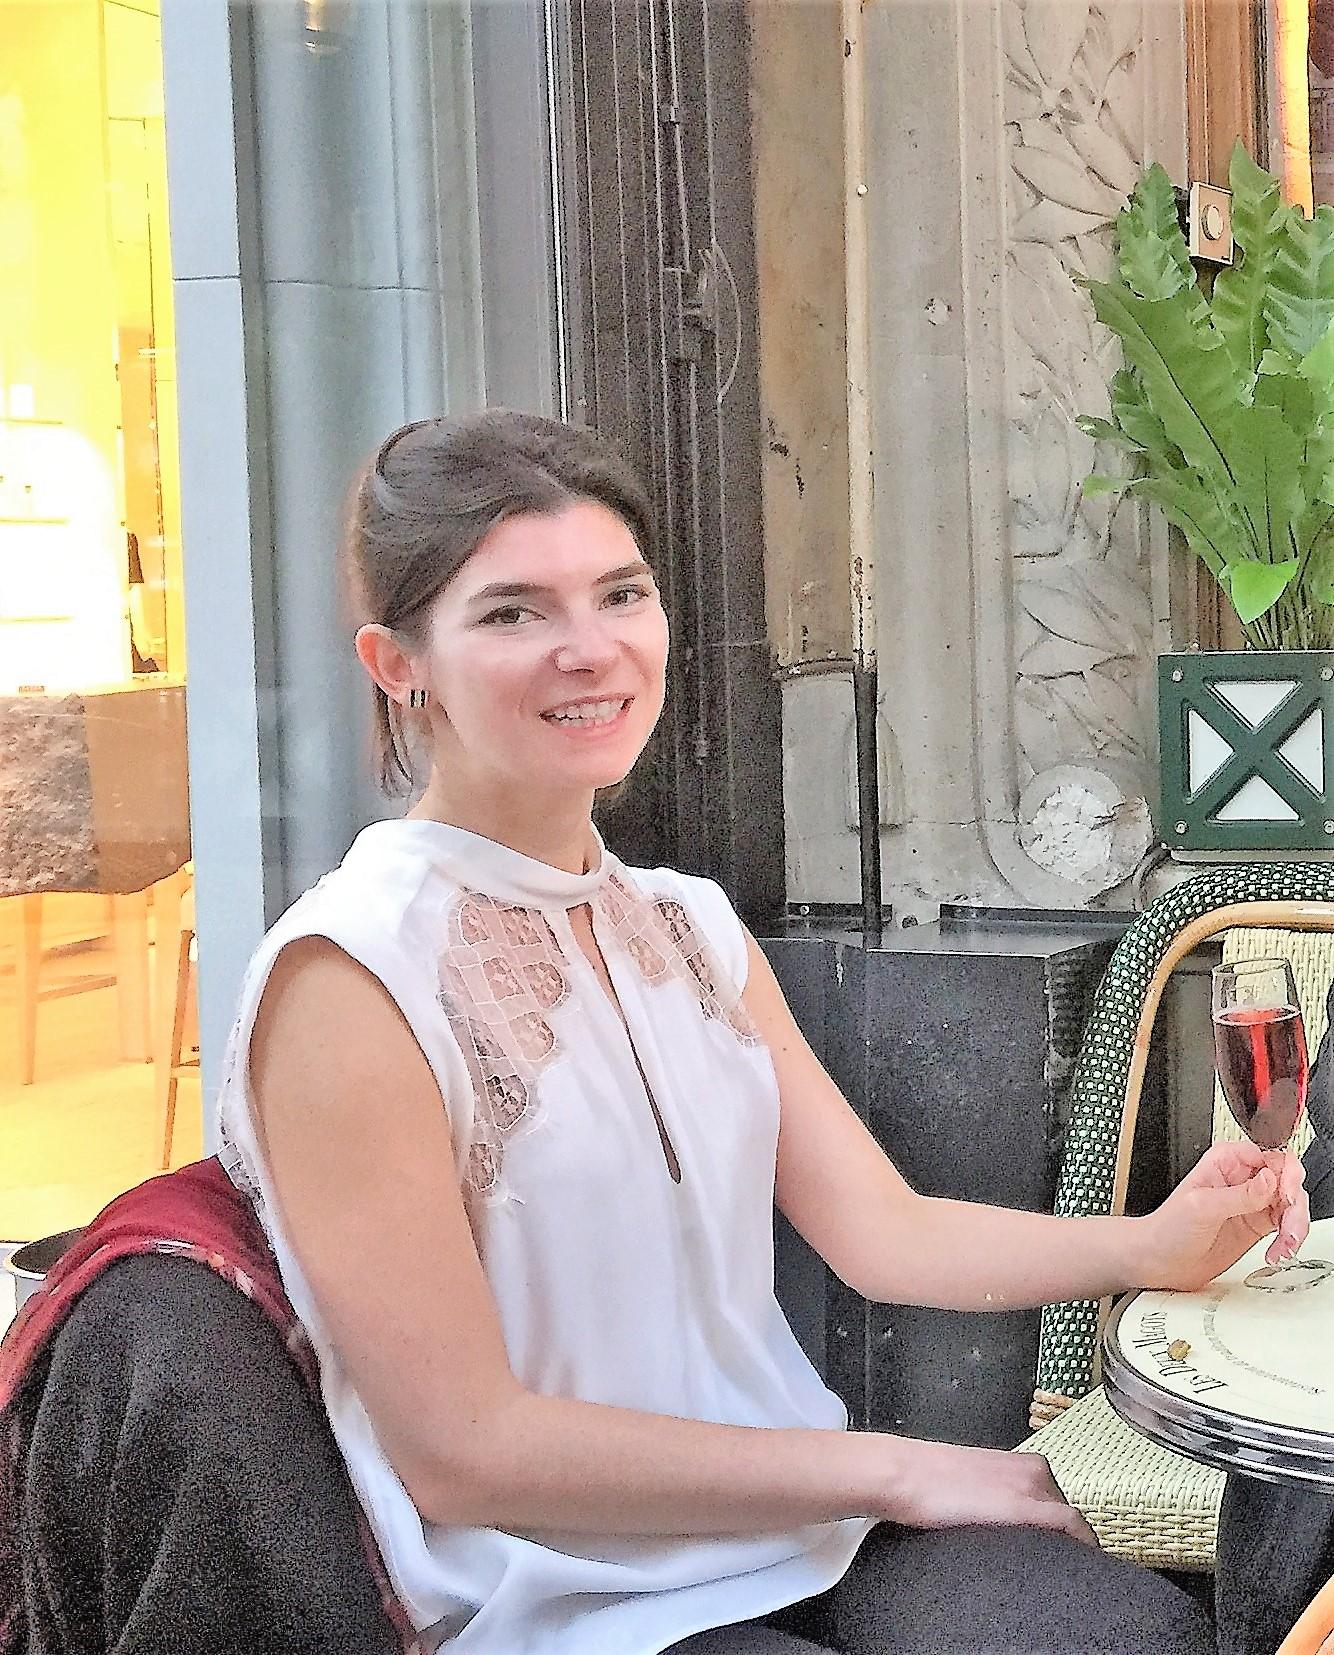 RuePigalle_Blog_ParisProvence_Travel_MotherDaughter_Trip_IMG_6414.JPG